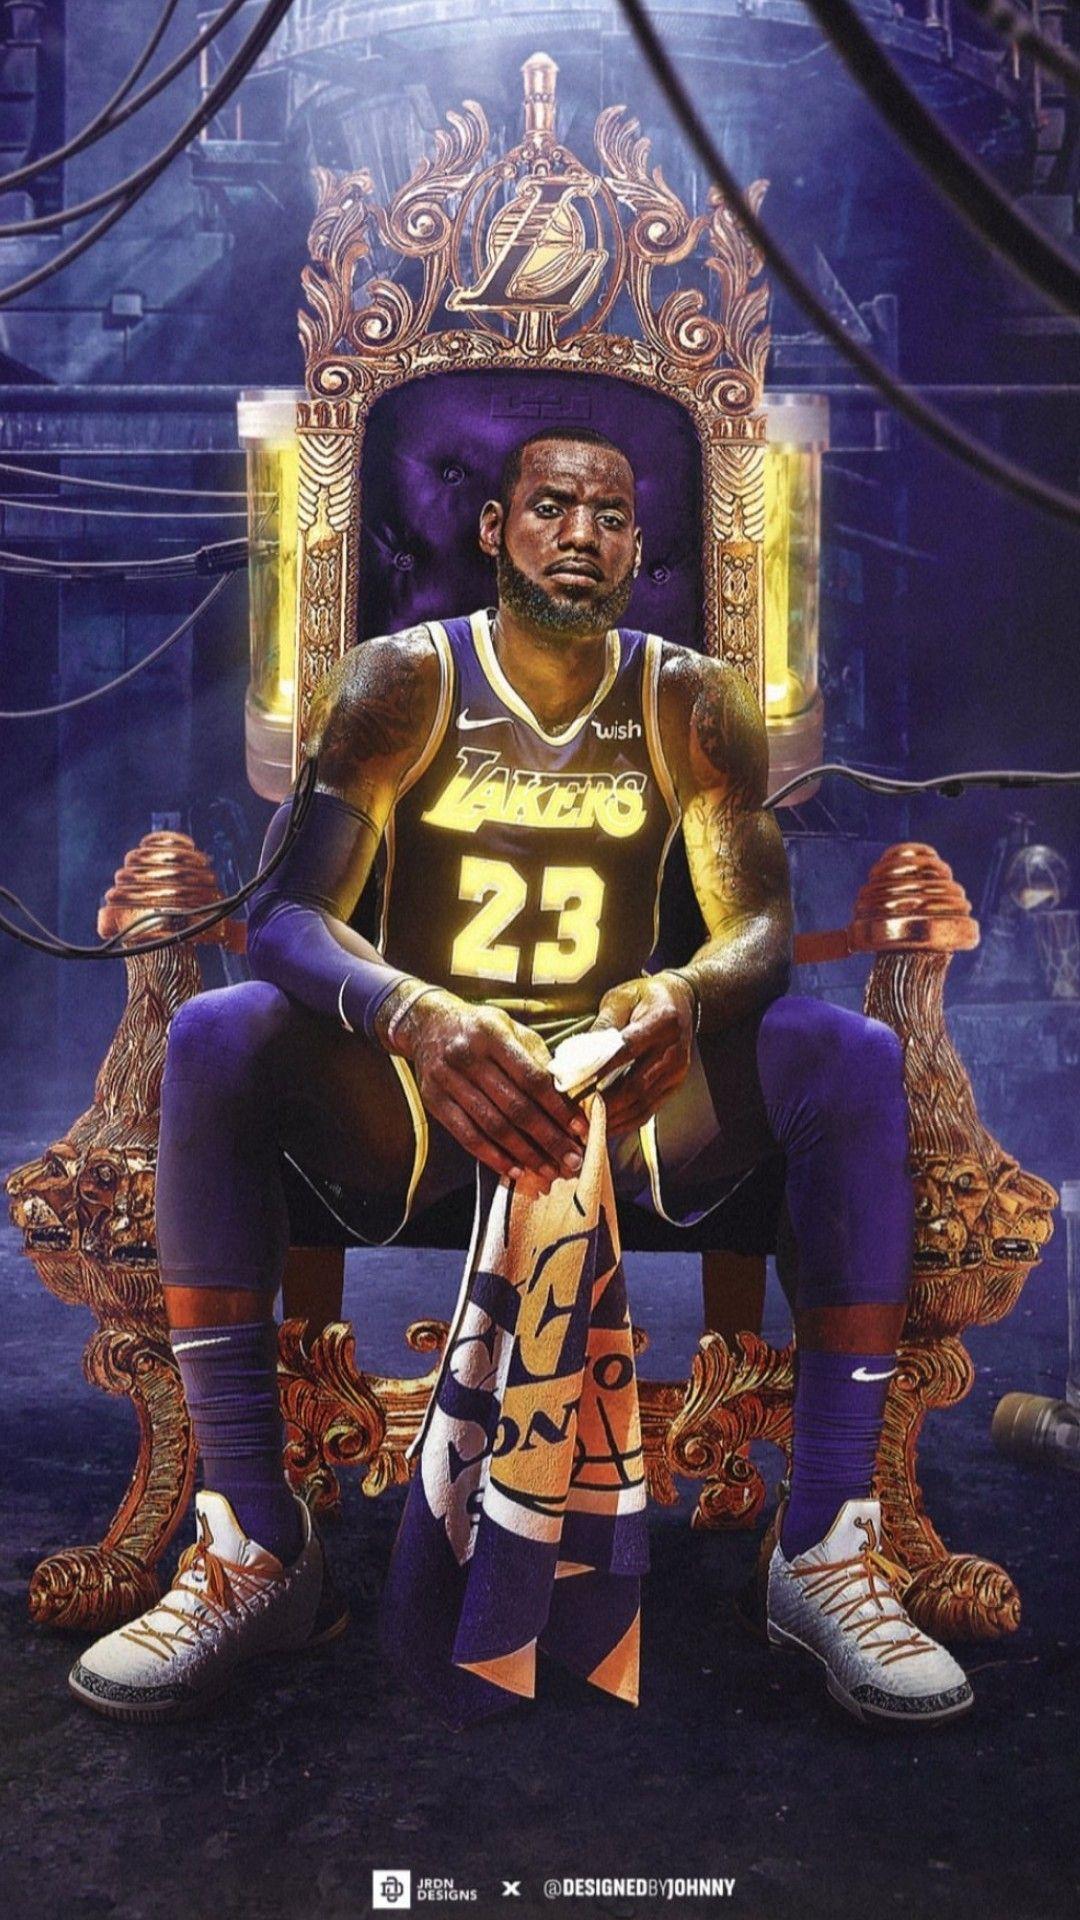 Lebron James Wallpaper Lebron James Lakers Lebron James Wallpapers King Lebron James